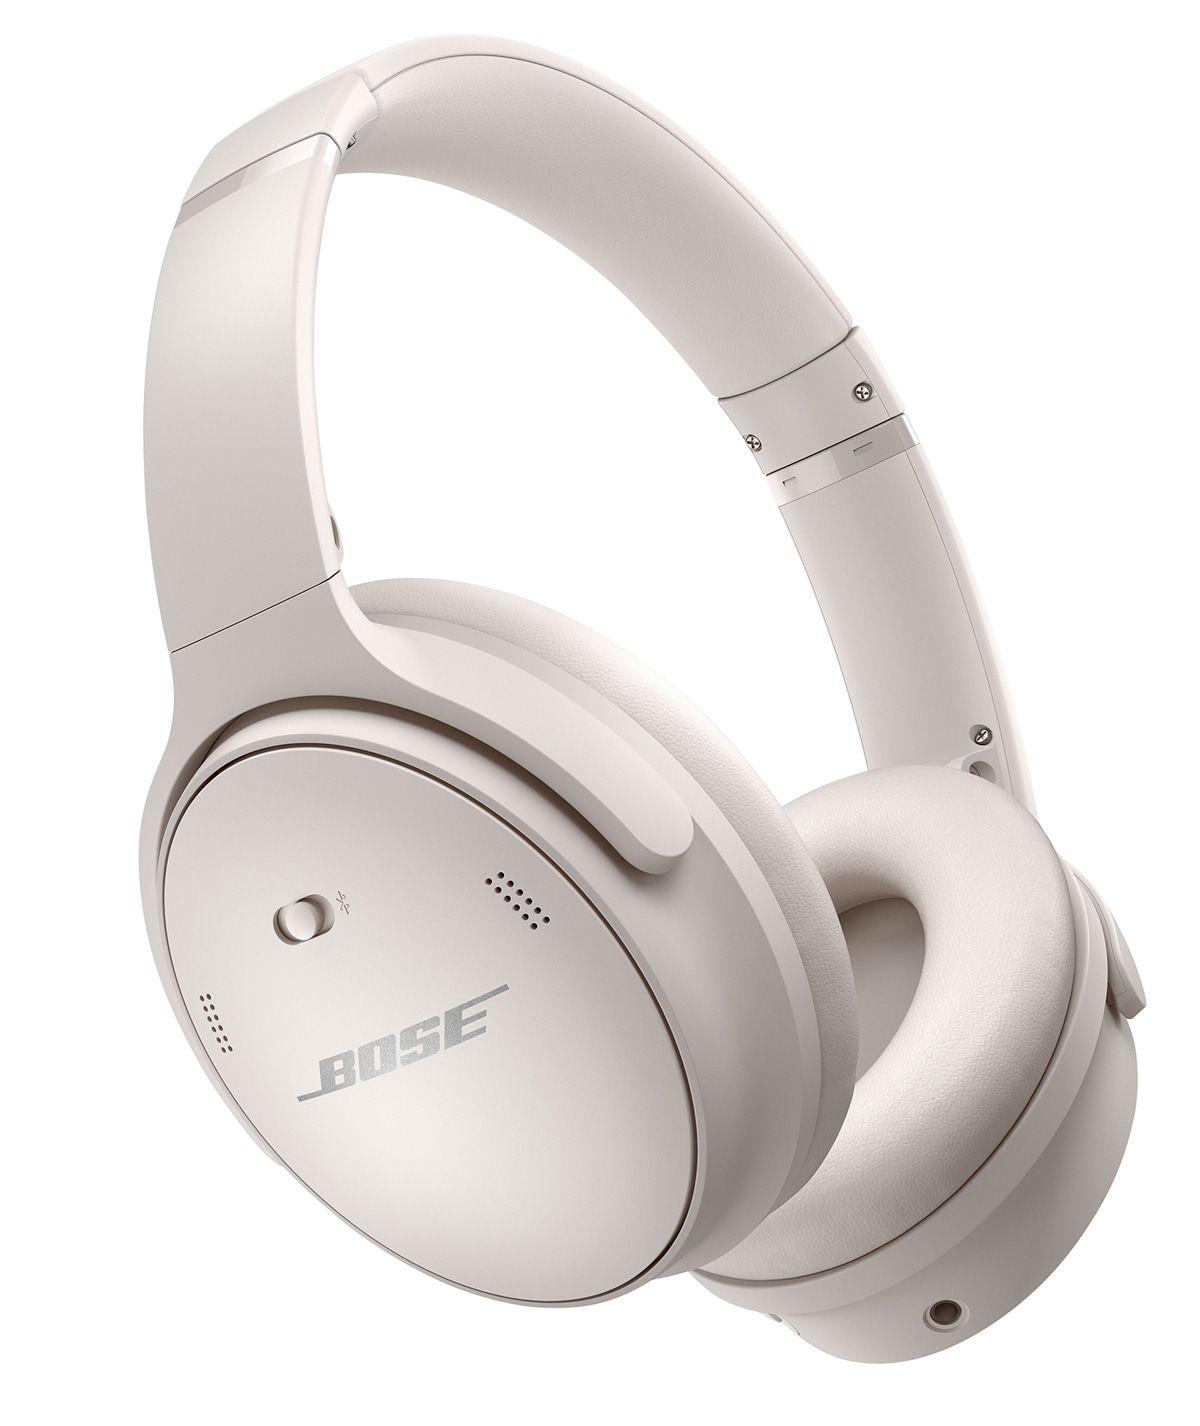 Bose kommt mit neuem Quiet-Comfort-Kopfhörer